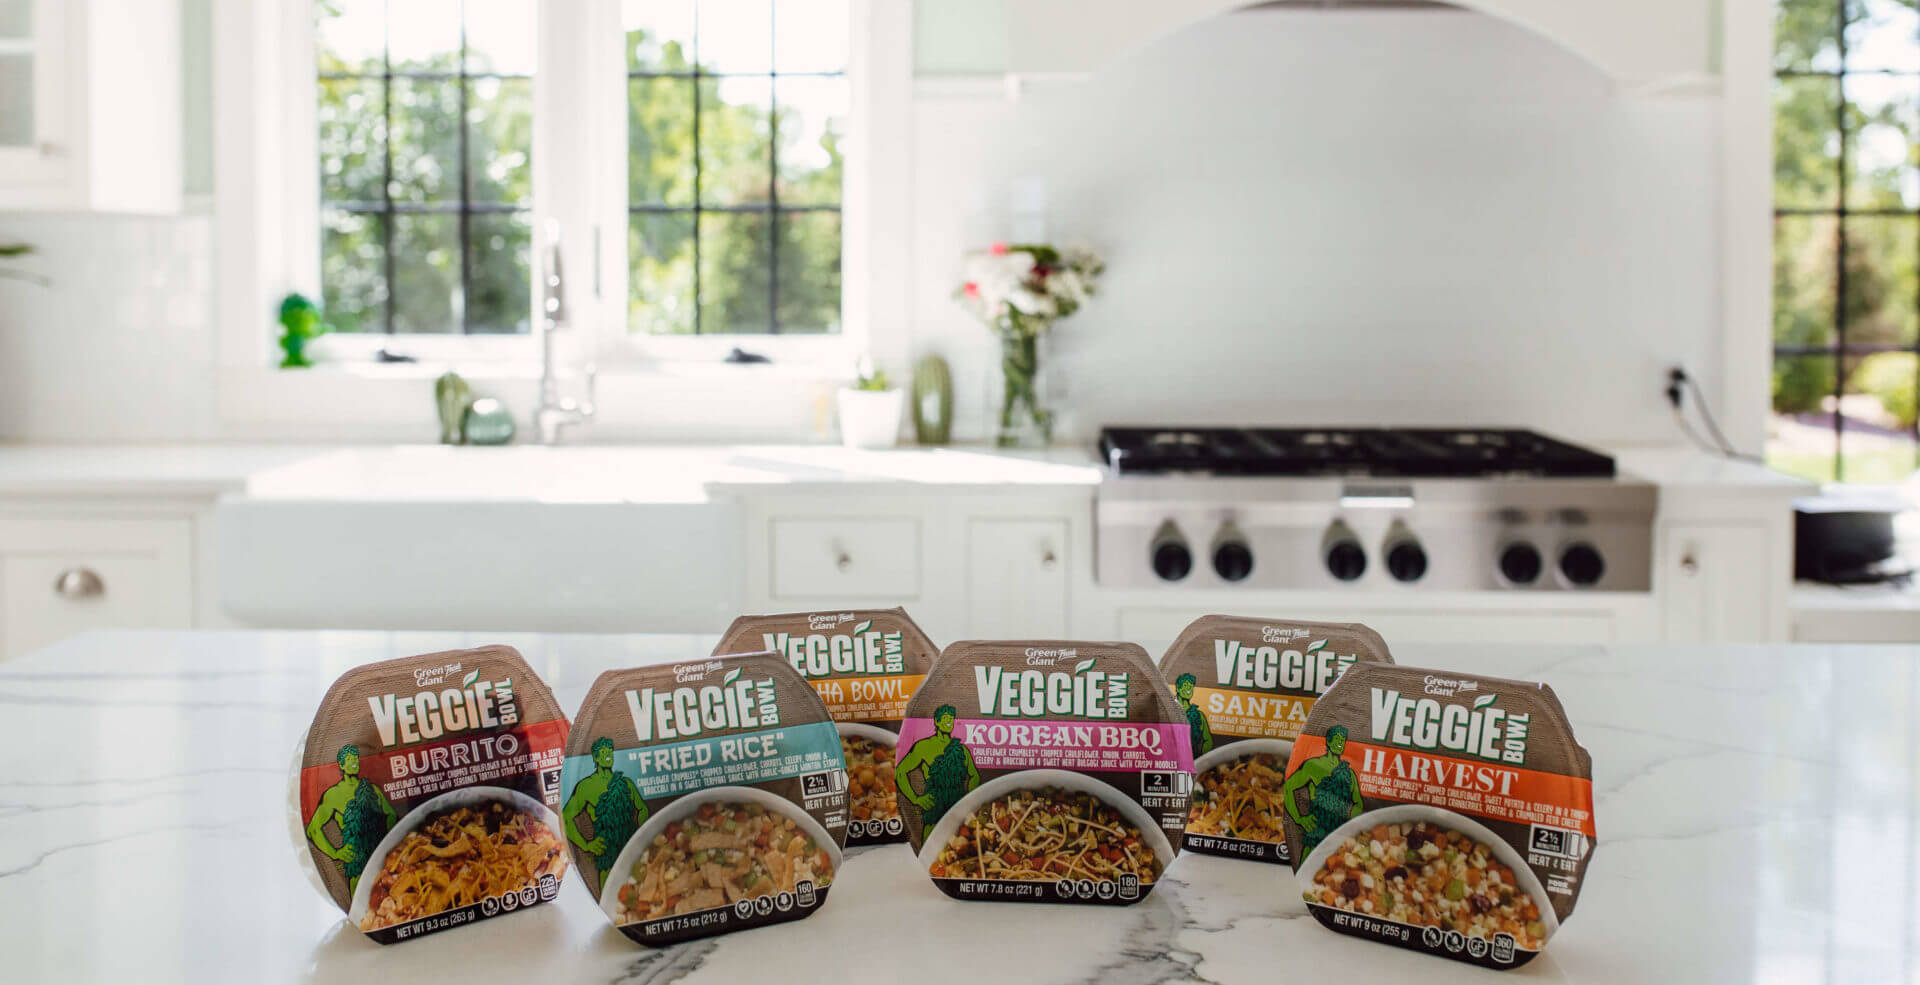 Green Giant™ Fresh Veggie Bowls